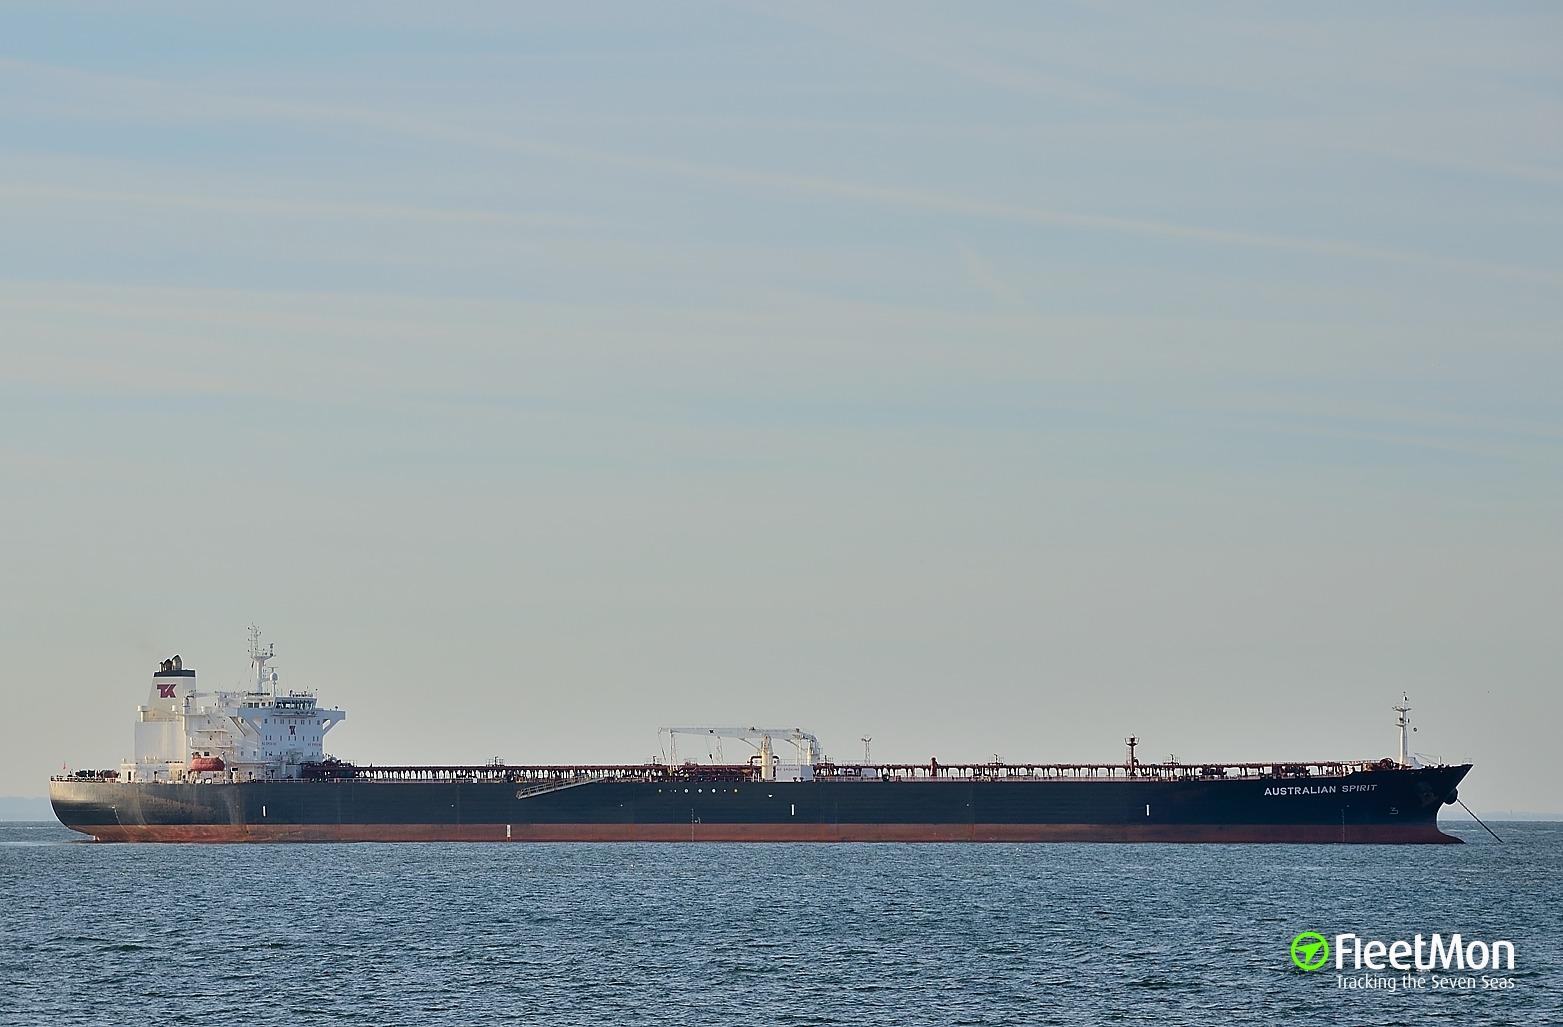 Aframax crude oil tanker Australian Spirit on tow to Halifax